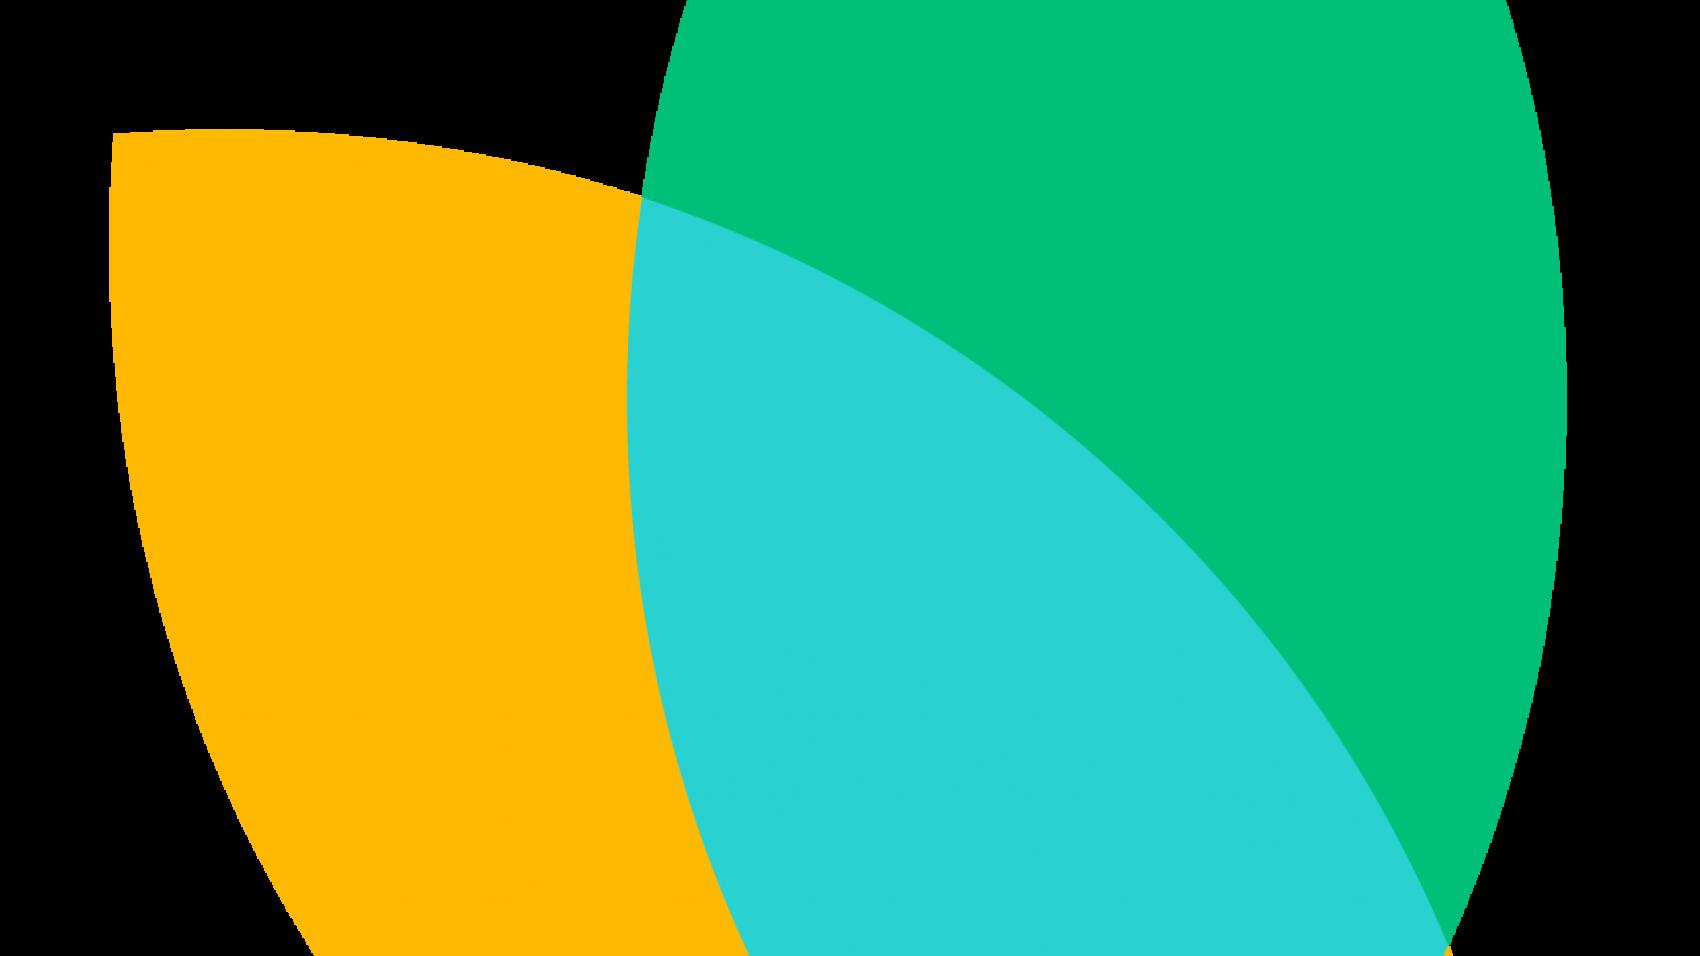 Petal_multicolors_6